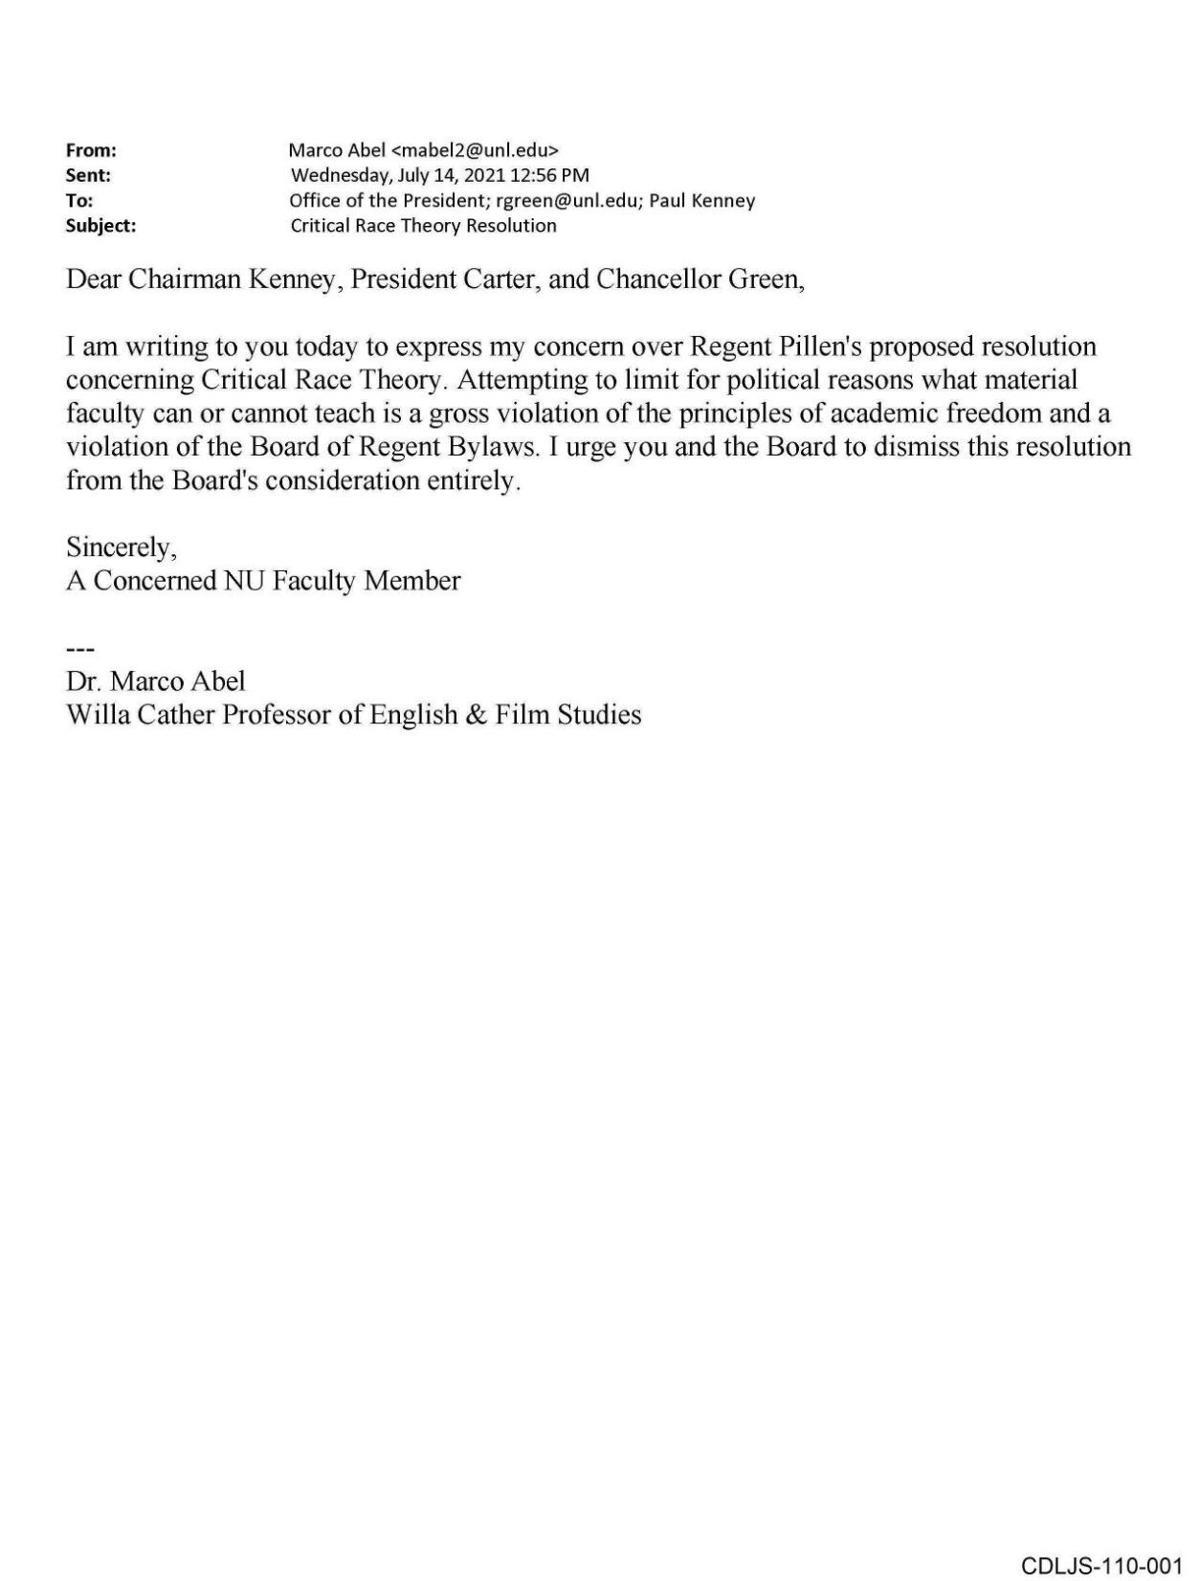 CDLJS-110-001.pdf